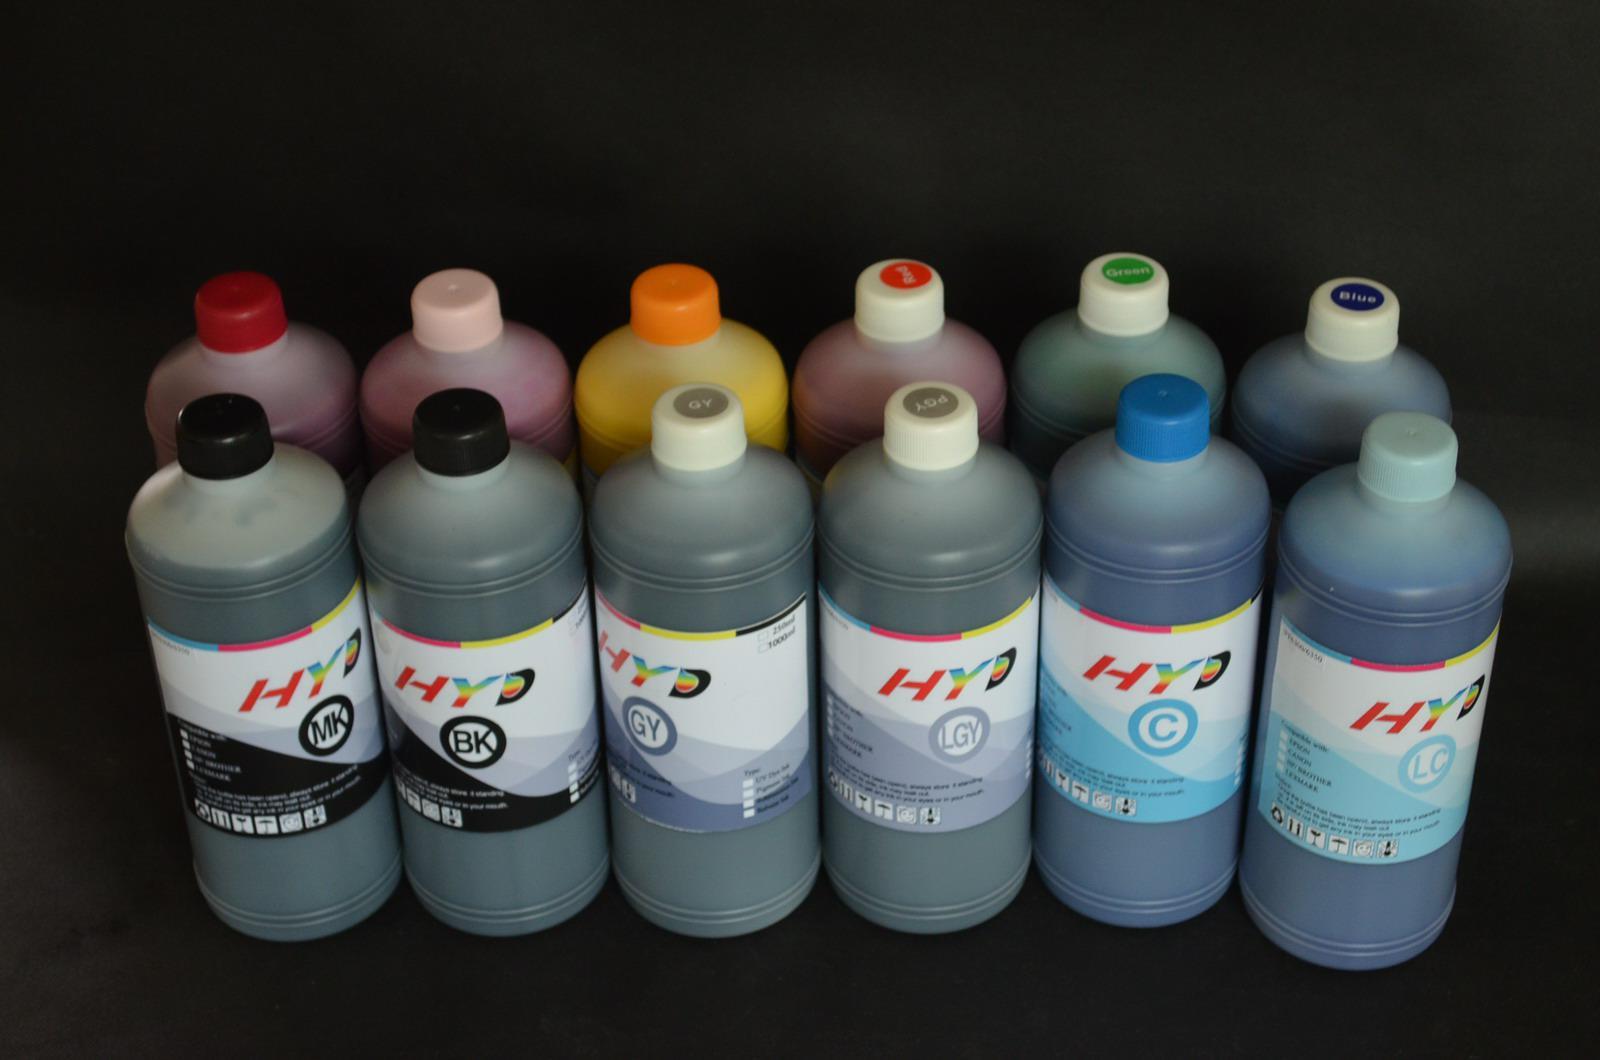 HYD 12 литров, 12 цвет-установил чернила пигмента LUCIA EX для канона imagePROGRAF iPF6300 .iPF6350 iPF6400 Ipf6450 Plotte (водонепроницаемый, Antu-UV) r